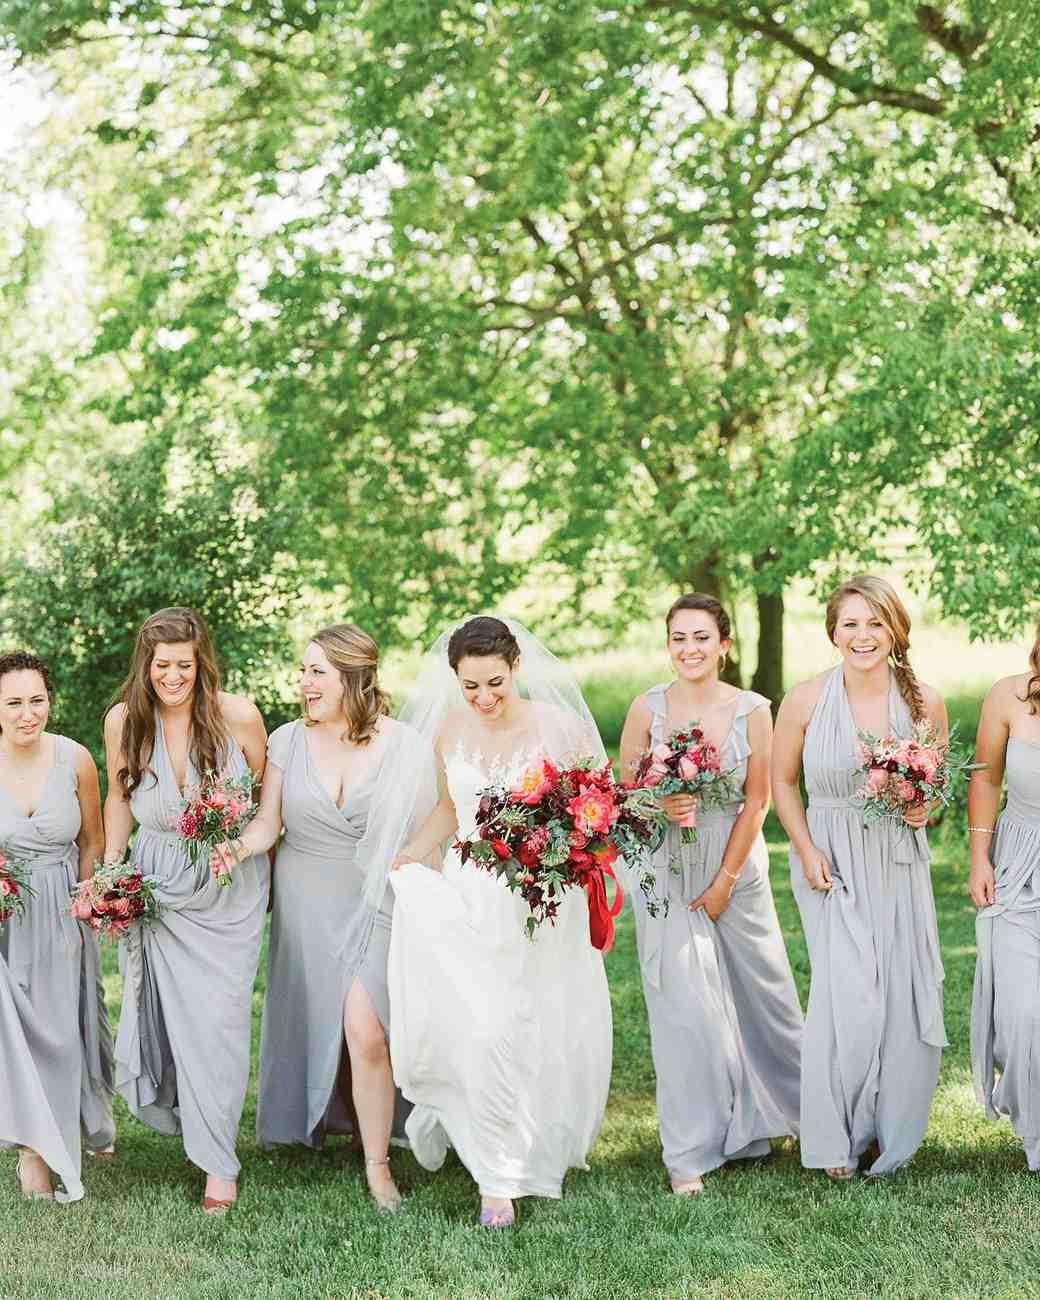 sasha-tyler-wedding-virginia-bridesmaids-brides-21-s112867.jpg